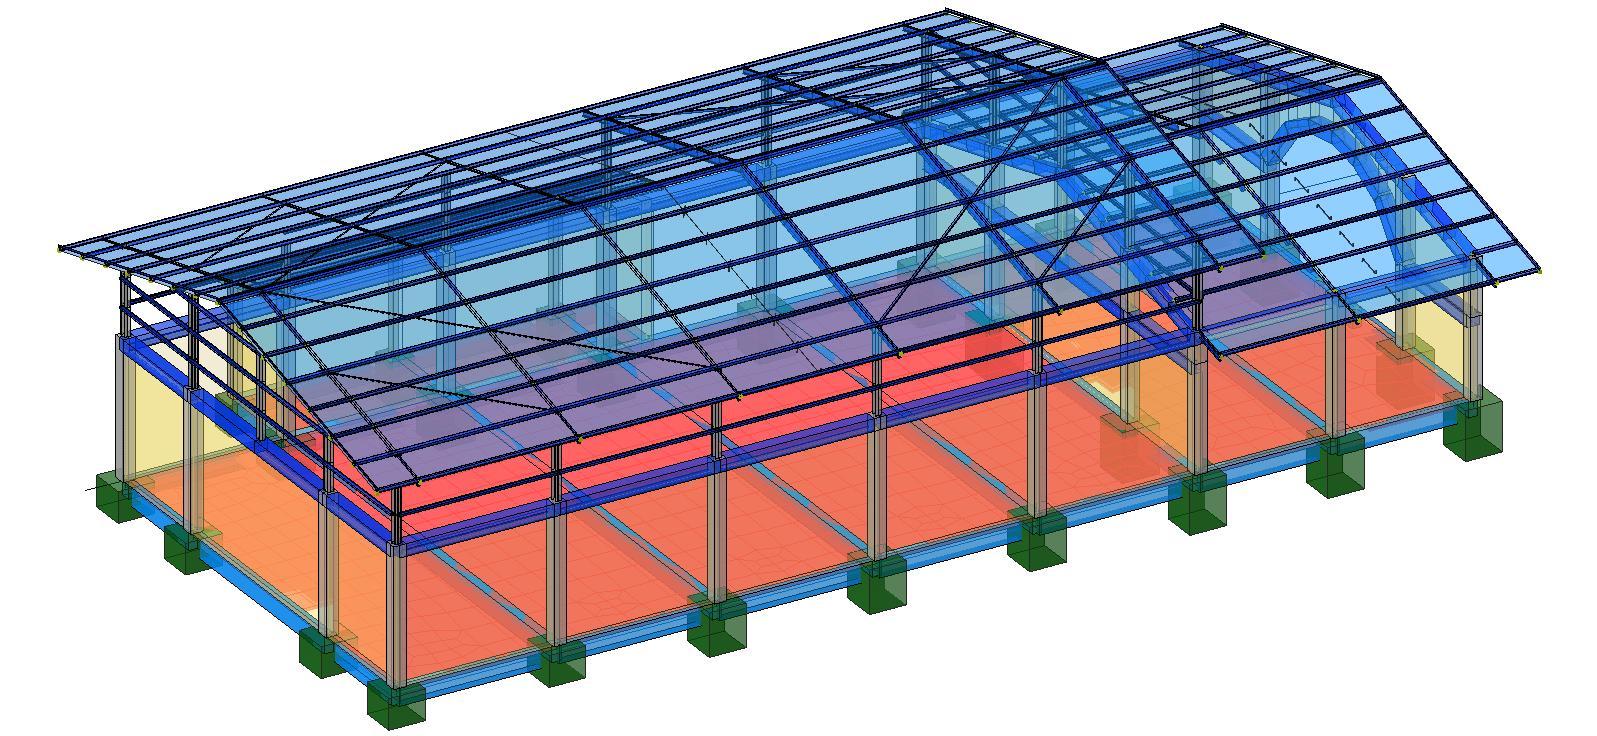 Modello strutturale - vista 2